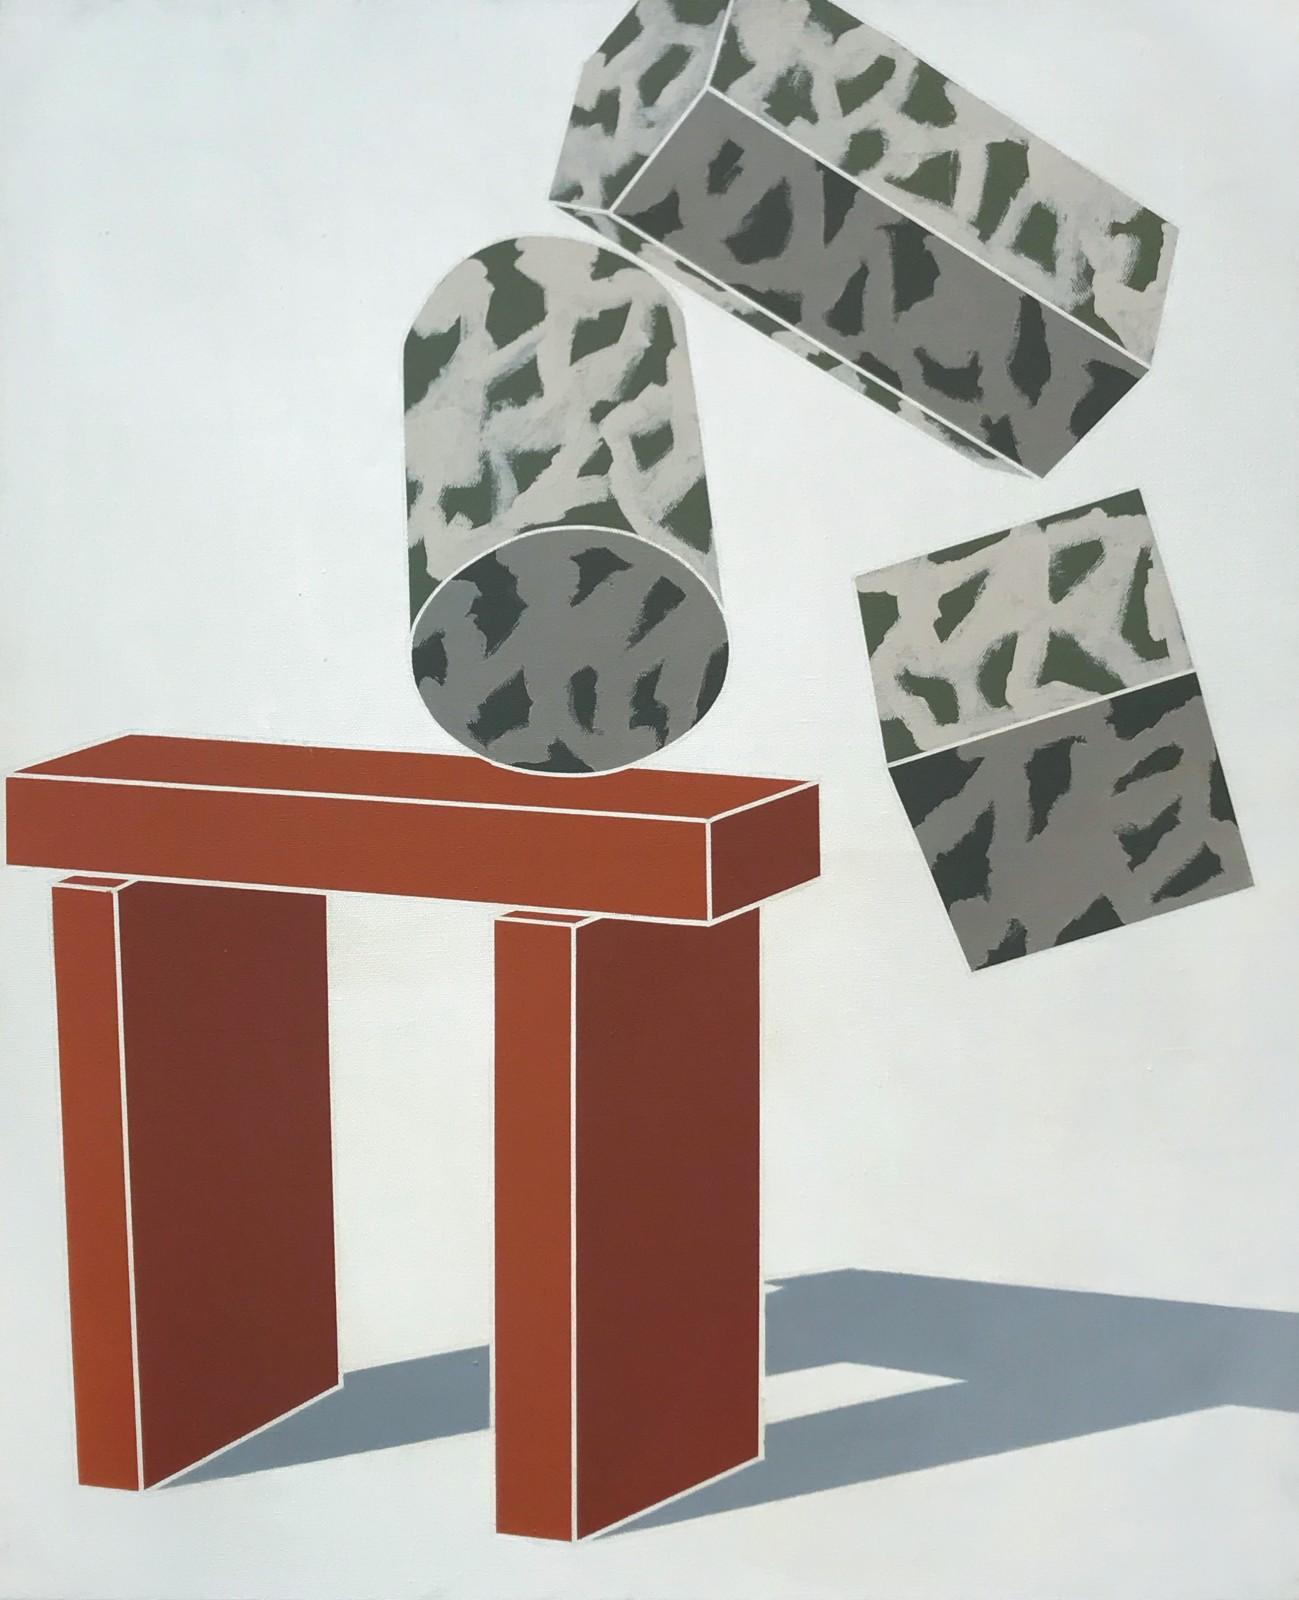 "<span class=""link fancybox-details-link""><a href=""/exhibitions/553/works/artworks_standalone11001/"">View Detail Page</a></span><div class=""artist""><span class=""artist""><strong>EMILIO TADINI</strong></span></div><div class=""title""><em>Paesaggio Occidentale / Western Landscape</em>, 1970</div><div class=""medium"">Acrylic on canvas</div><div class=""dimensions"">100 x 81 cm<br>39 ⅜ x 31 ⅞ inches</div>"